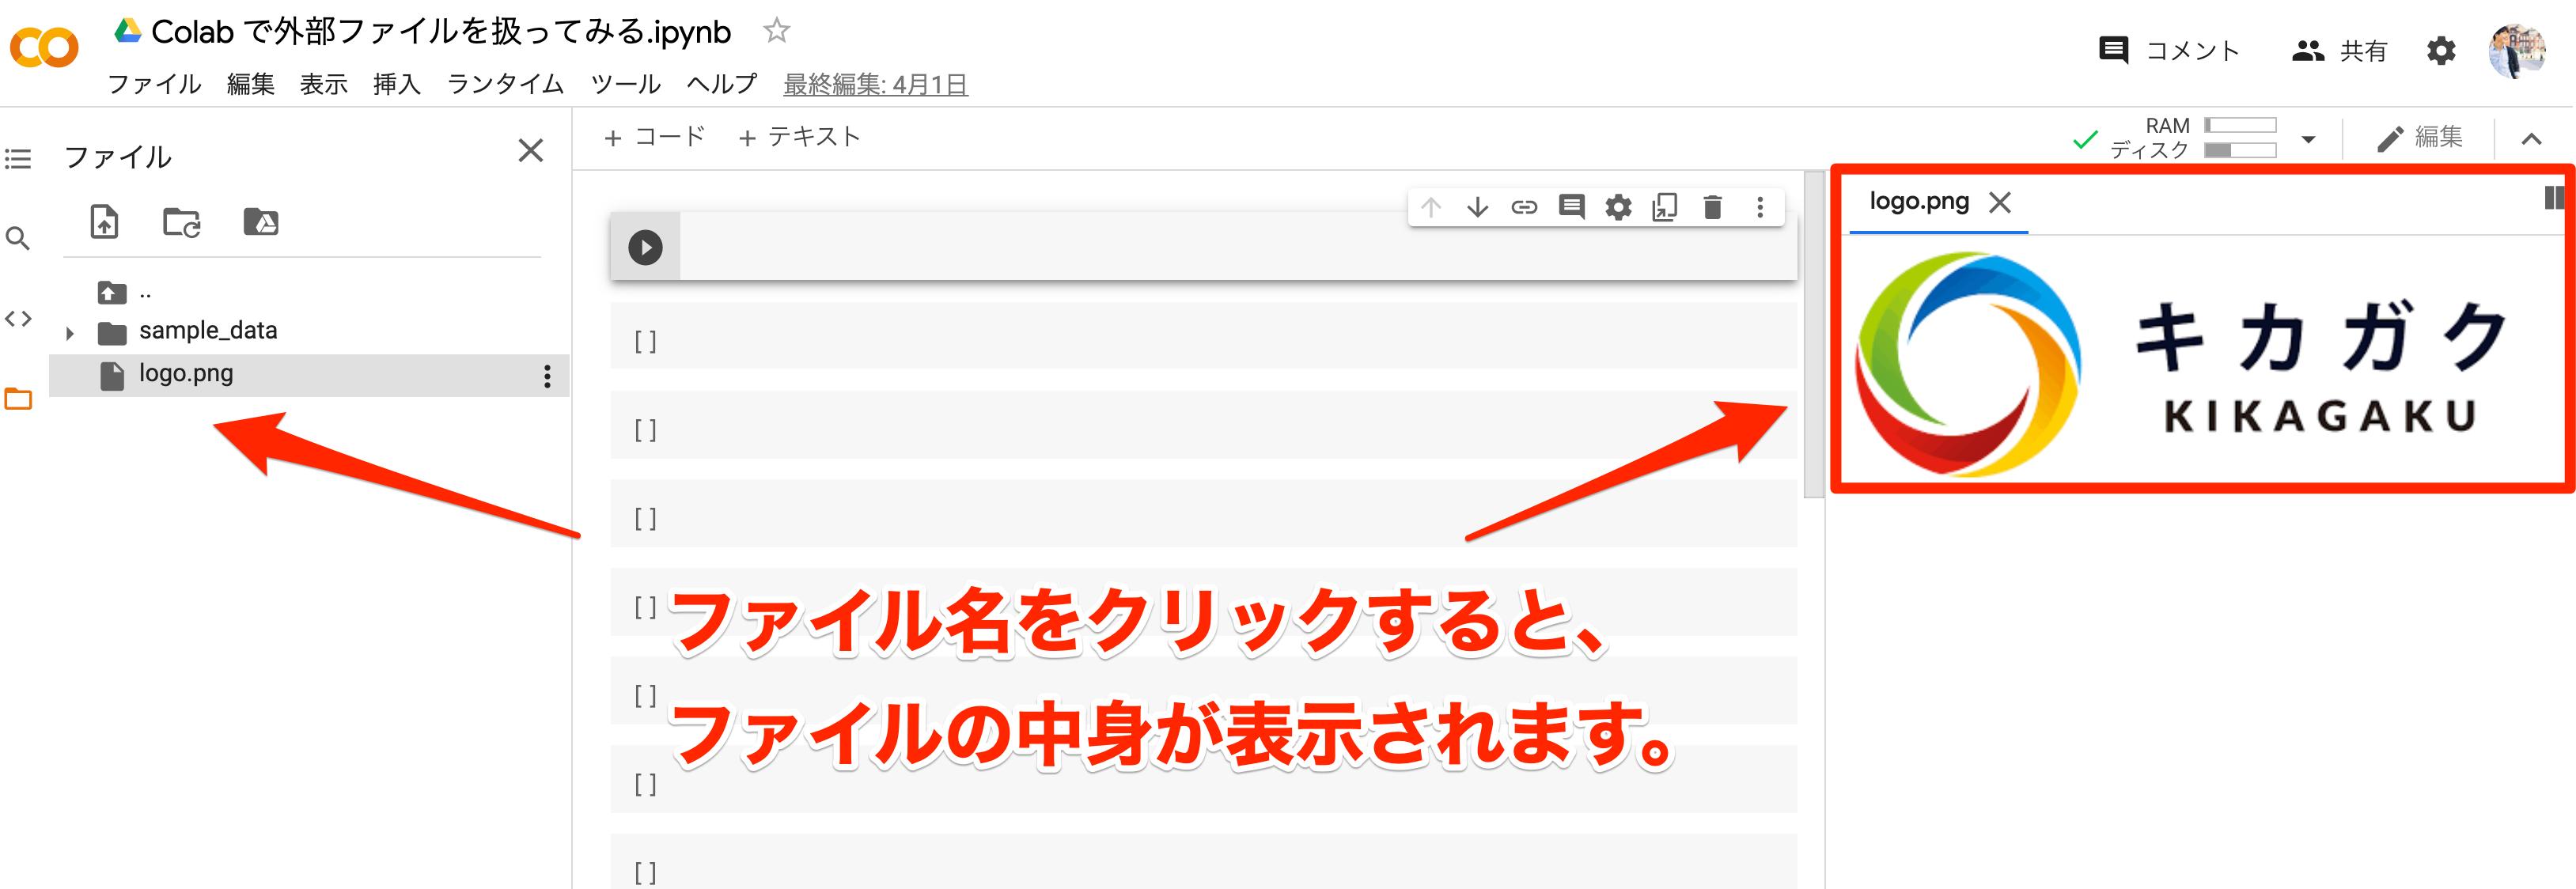 Google Colaboratory file